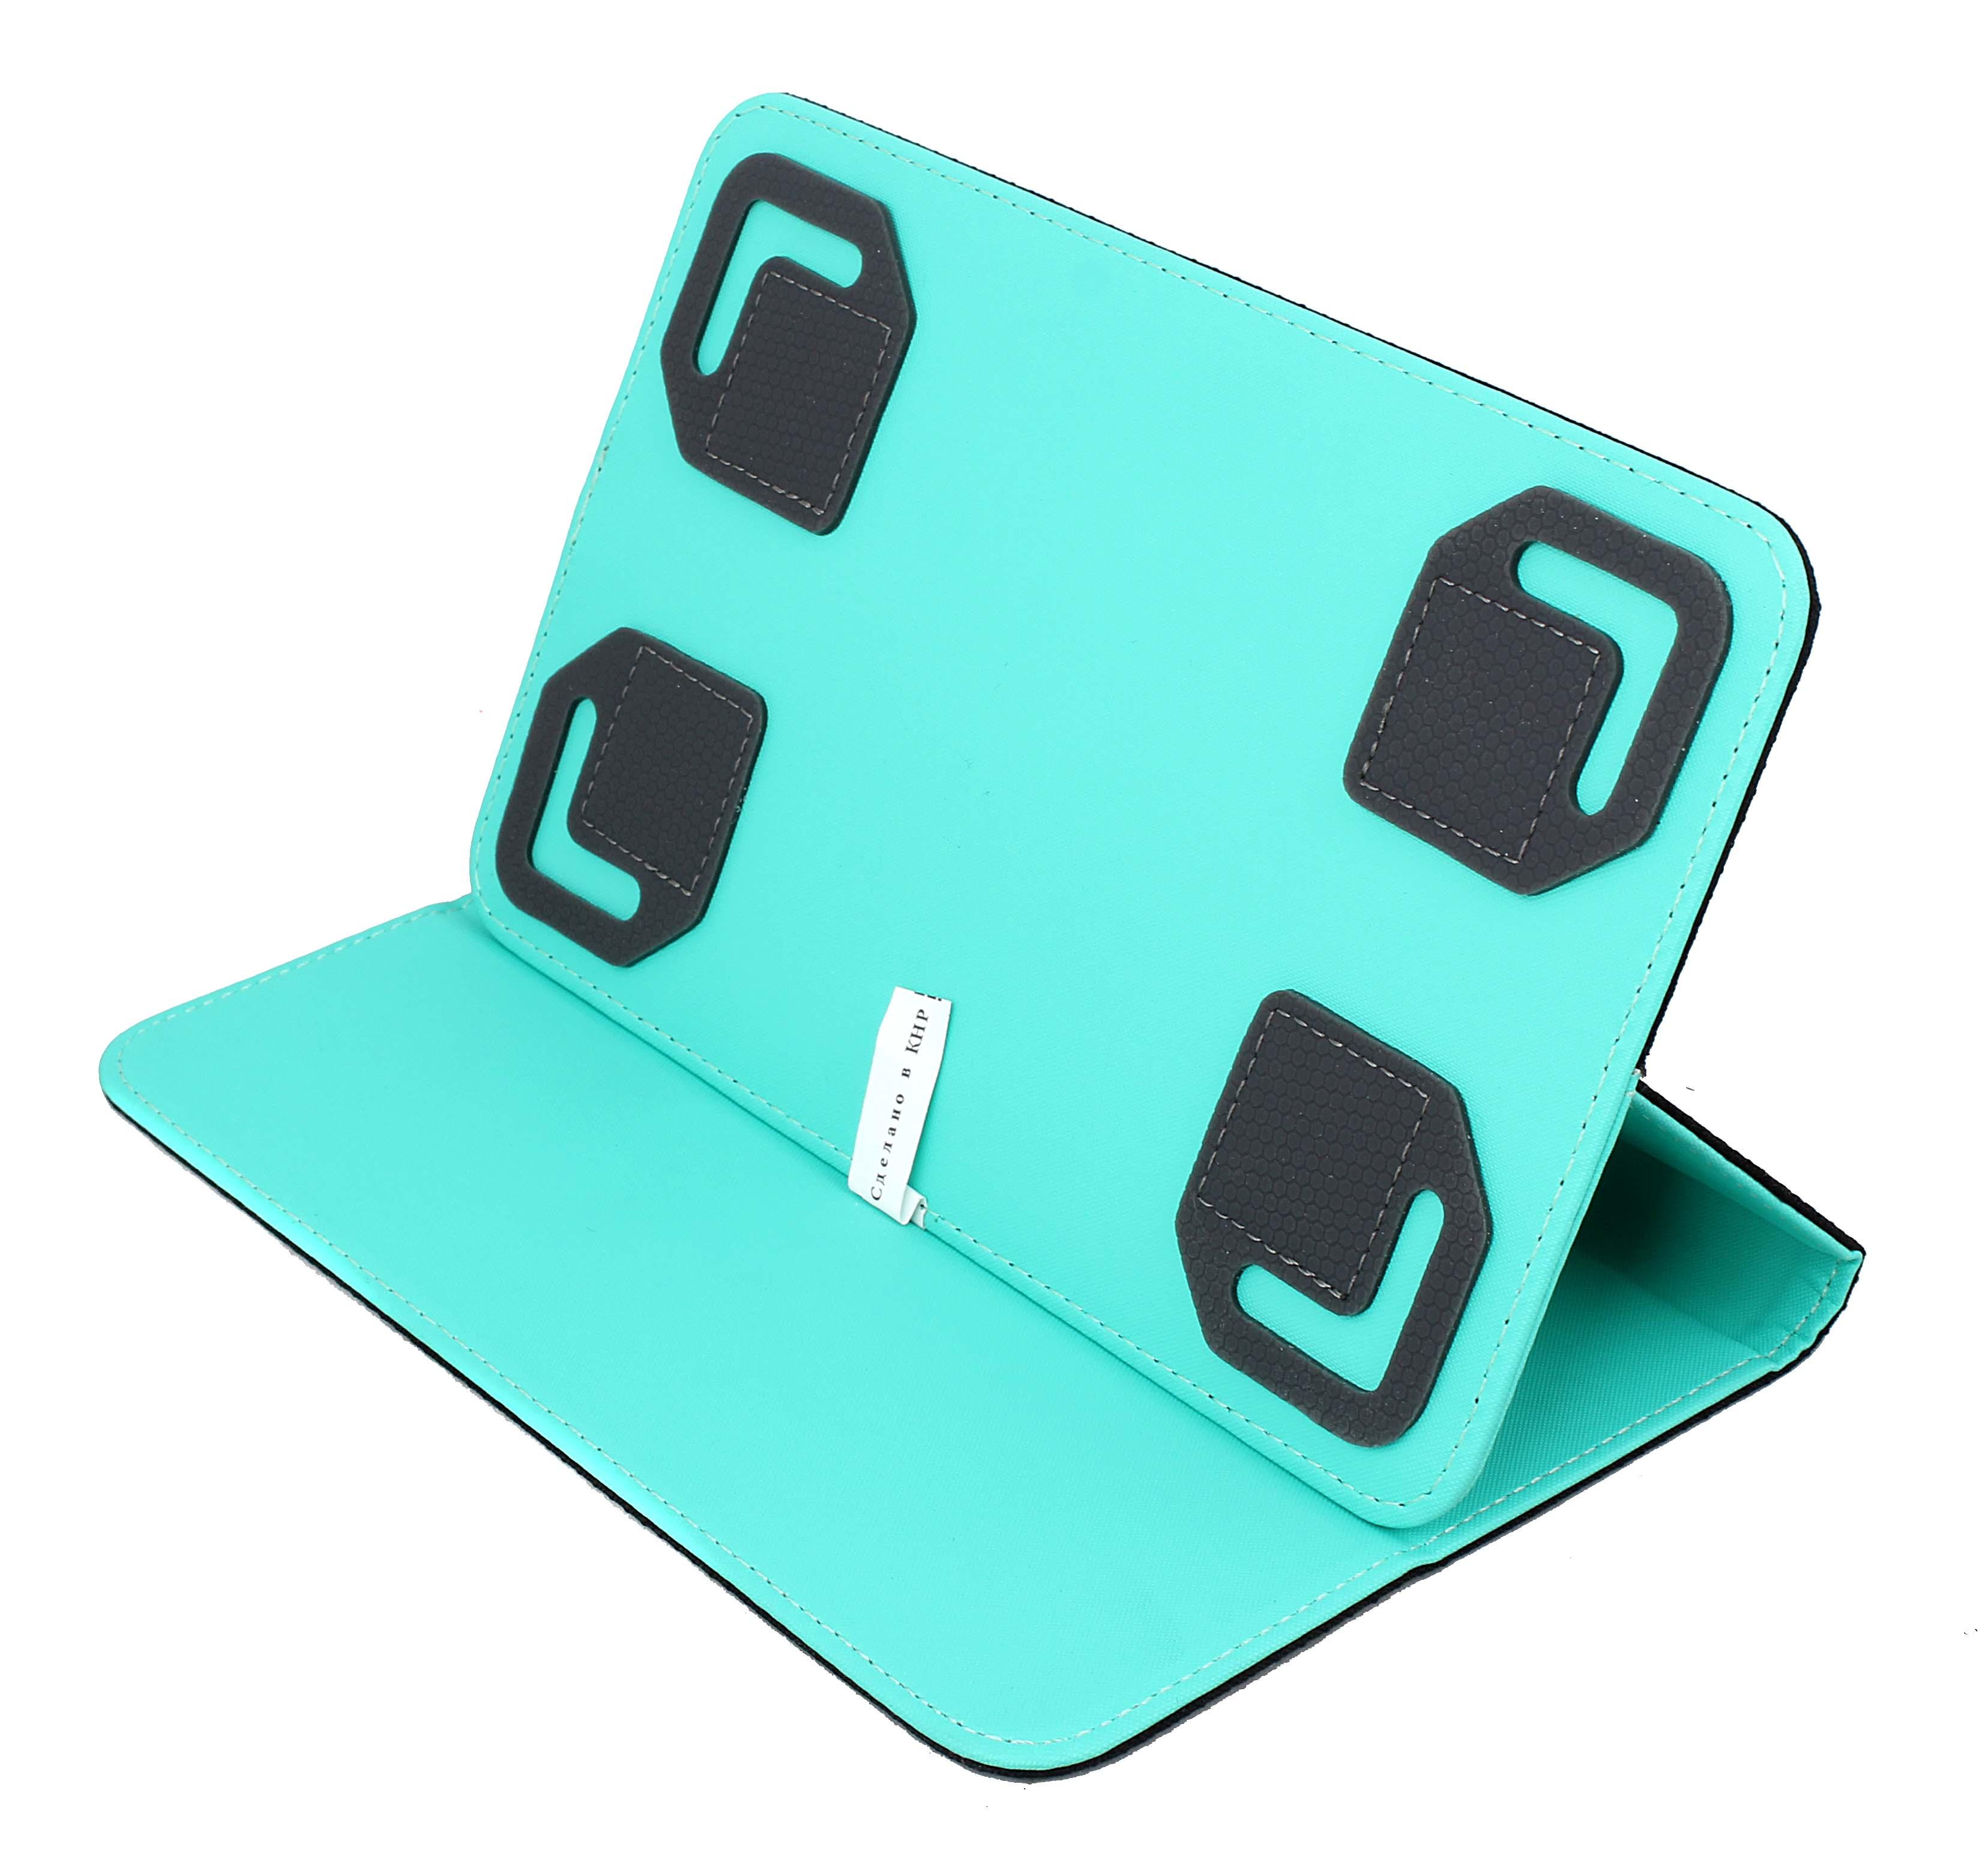 Чехол для планшетного ПК Рбт Real Brand Technics 699.000